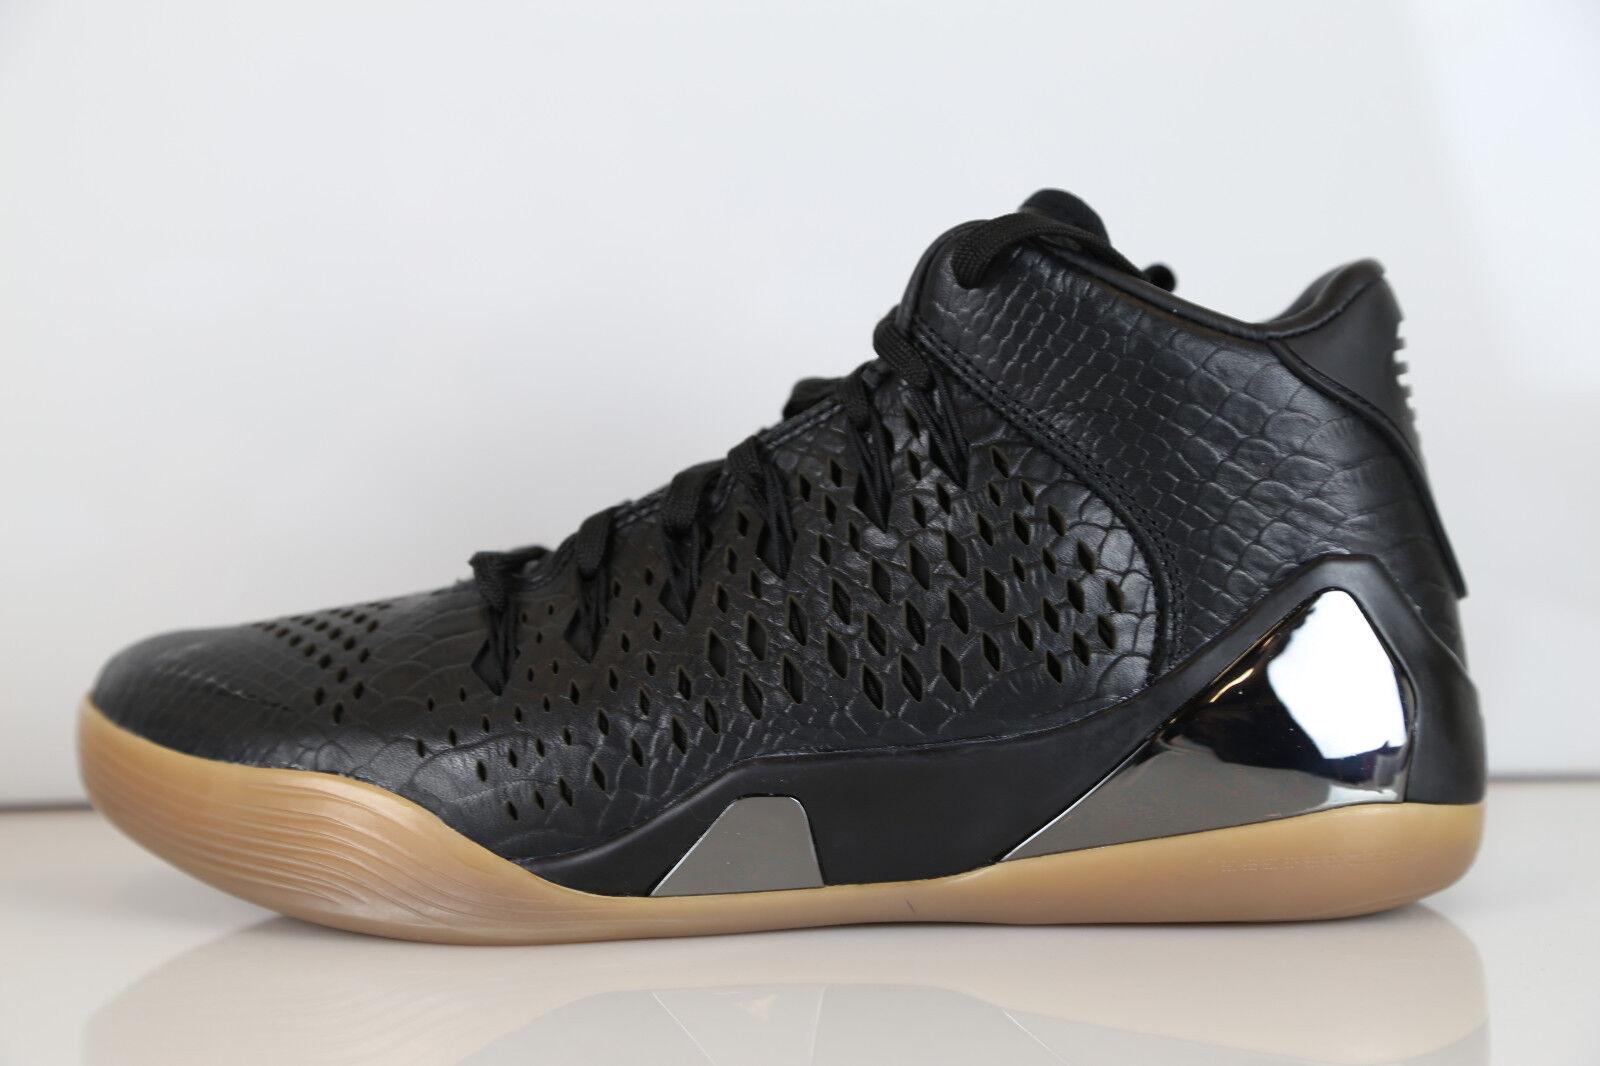 Nike Kobe IX Mid EXT QS nero Gum Snake 704286-001 10.5 9 supreme